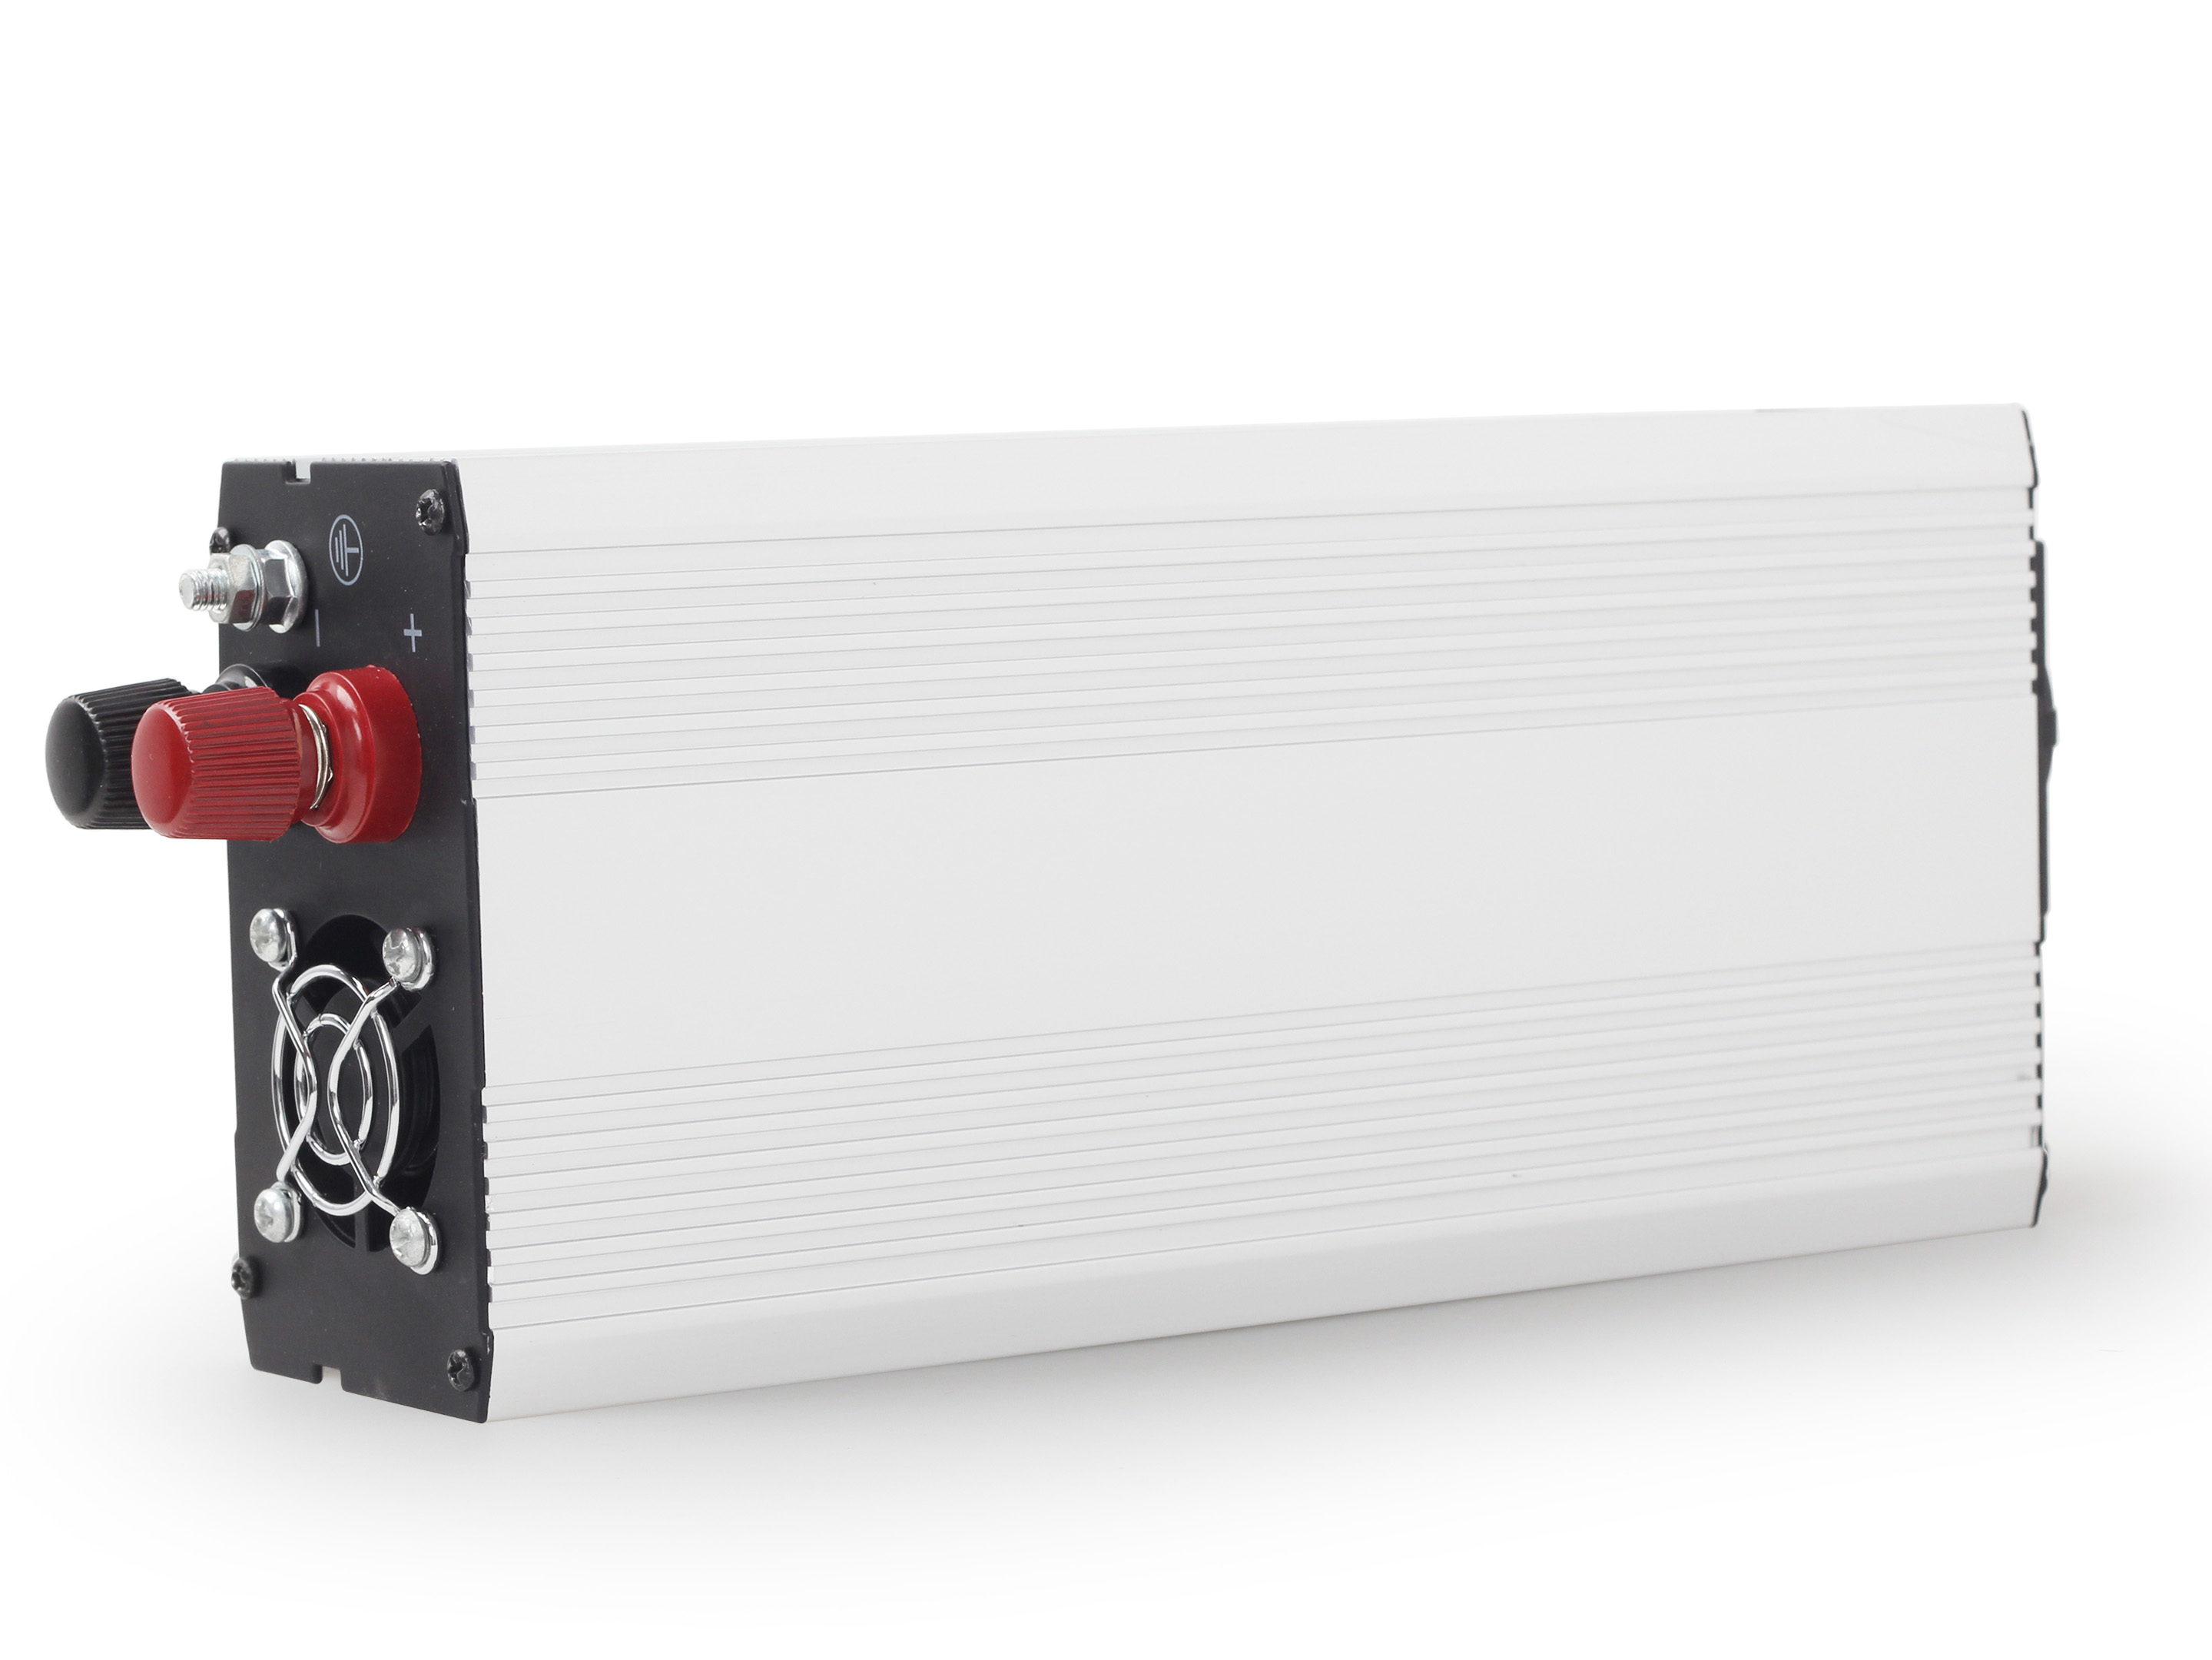 Автомобильный инвертор 12V/220V 500 ВТ ENERGENIE (EG-PWC-043) Energenie - фото 5